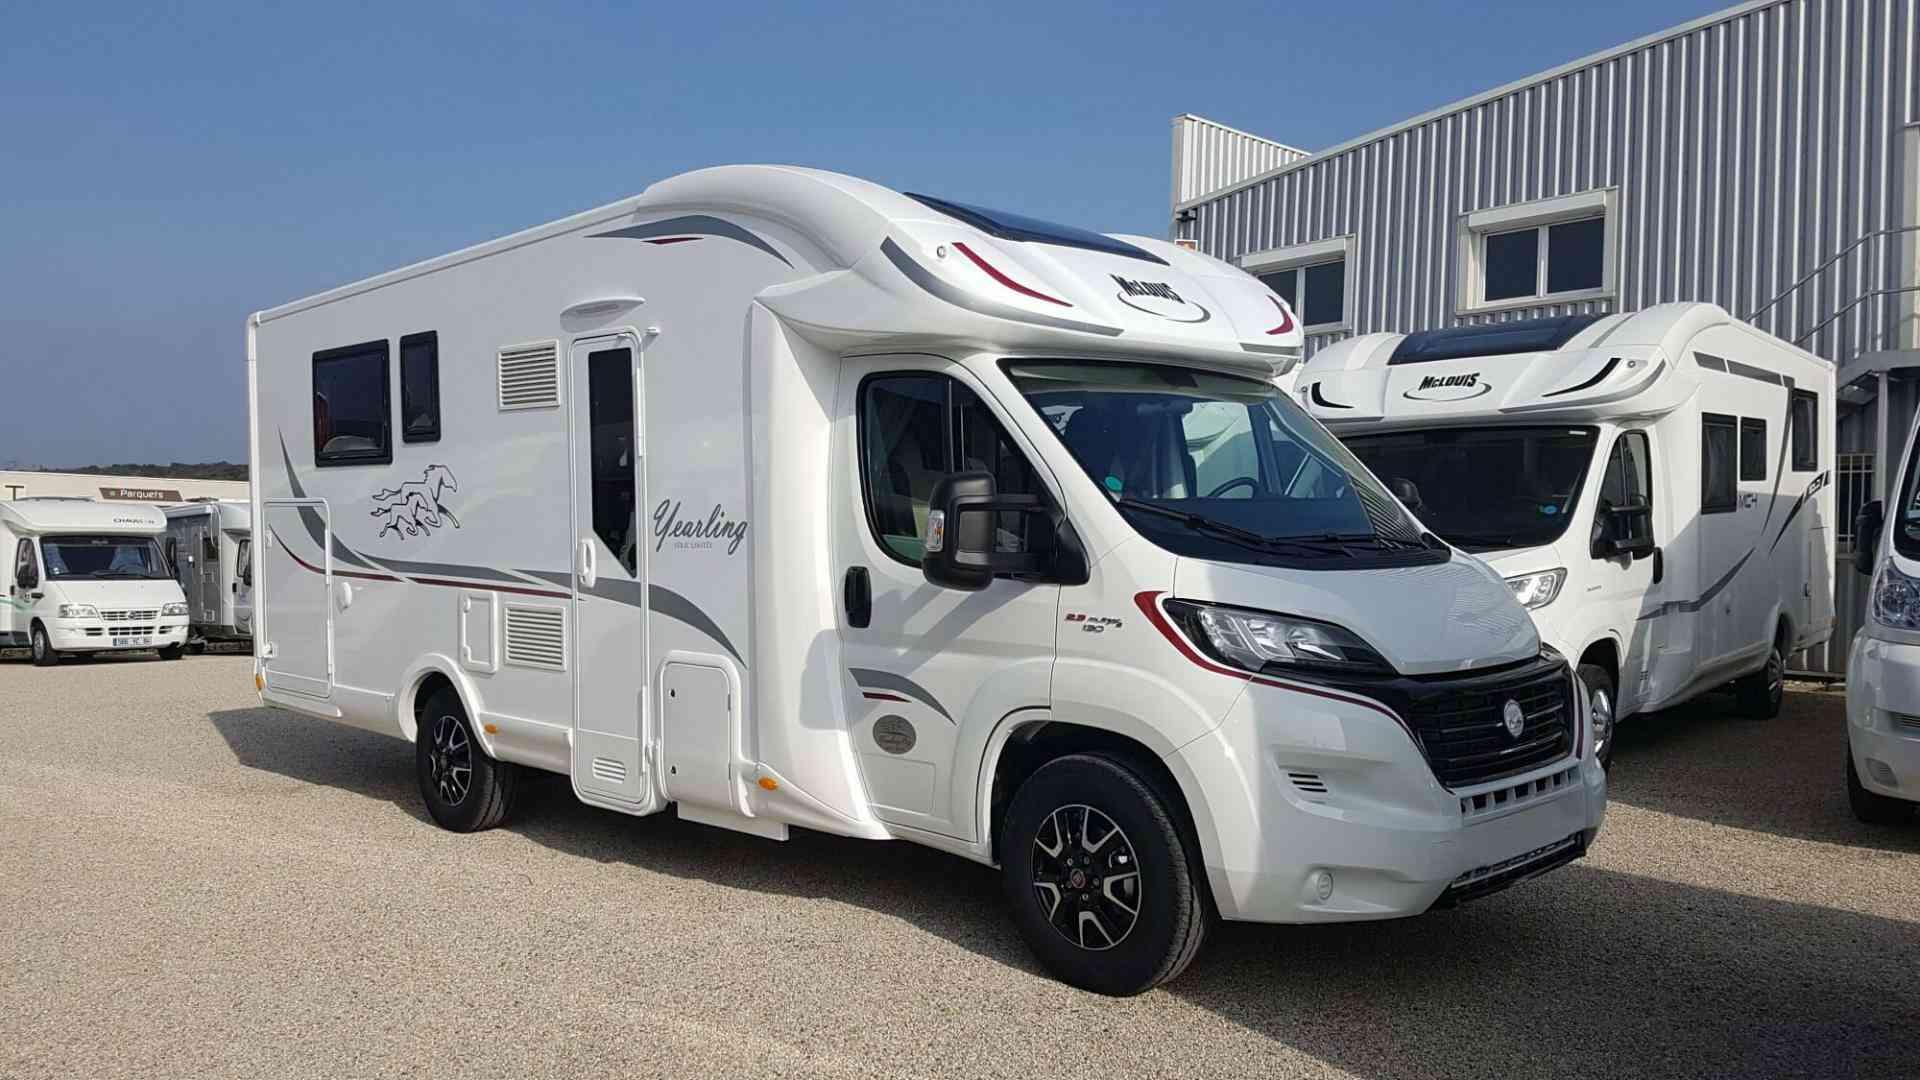 camping-car MC LOUIS YEARLING 81G